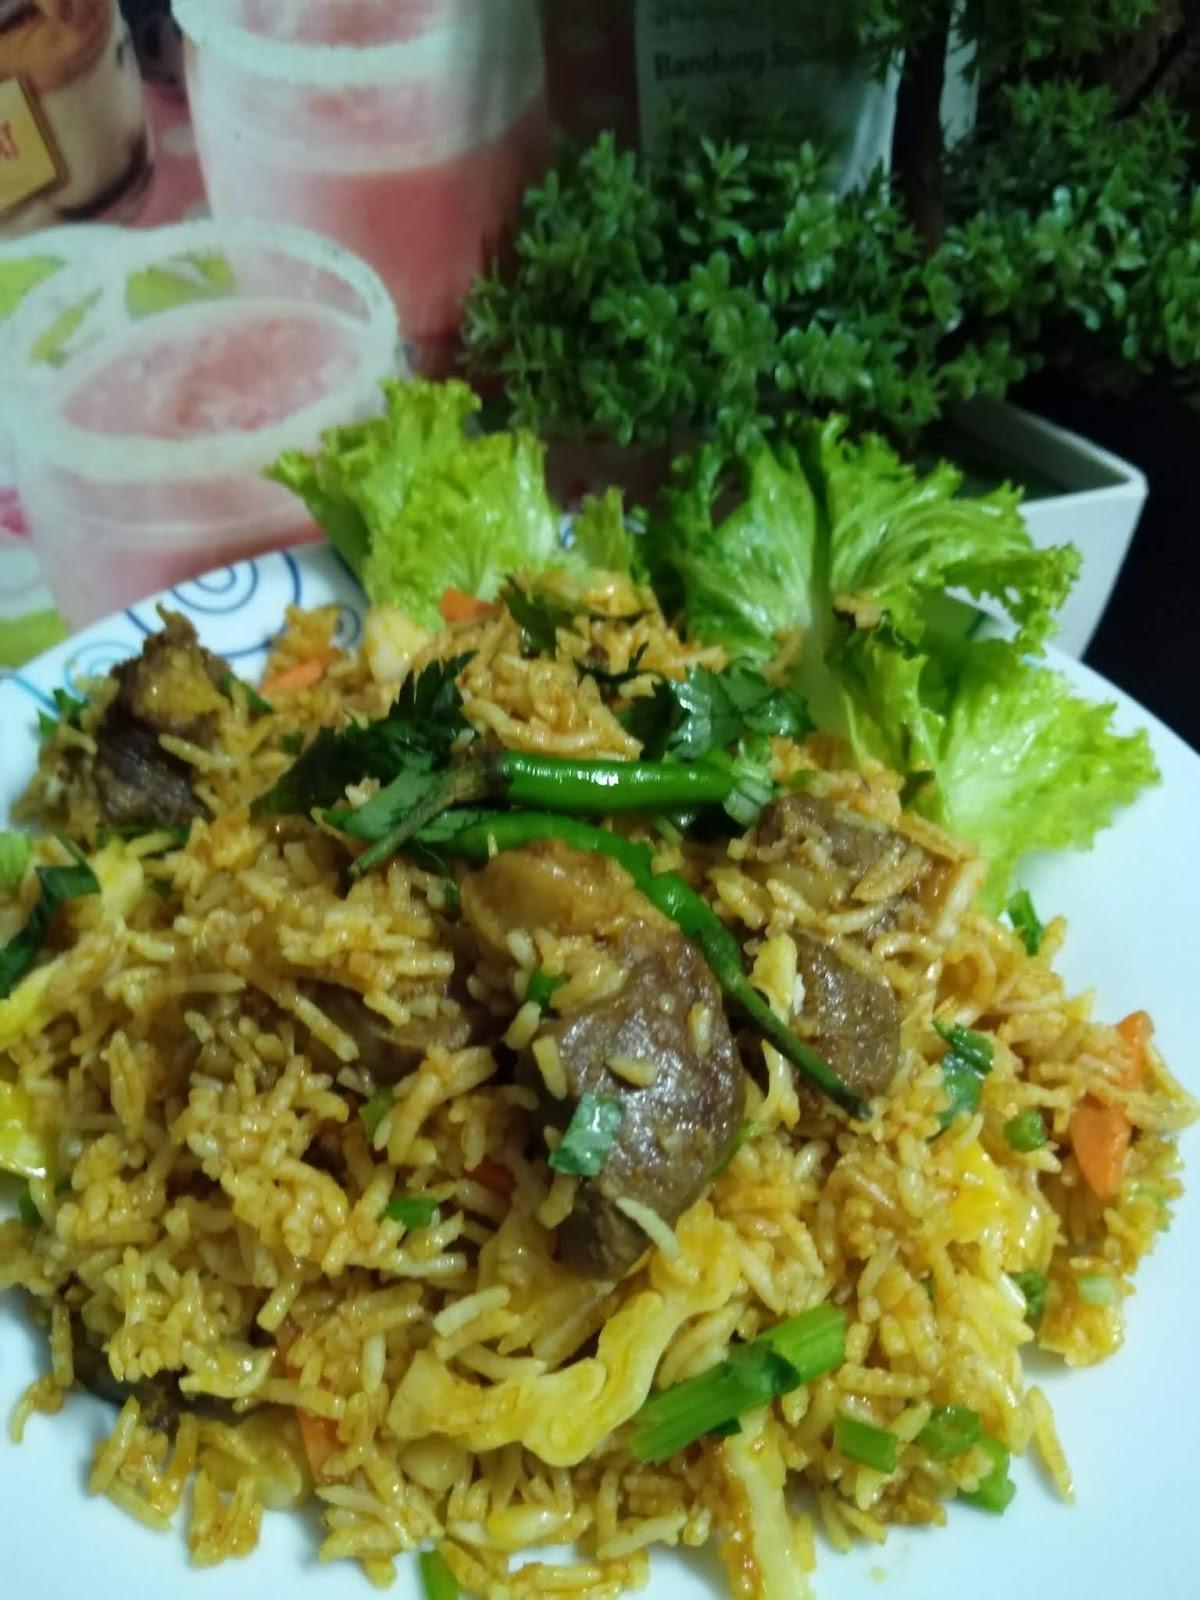 Inilah Resipi Nasi Goreng Kambing Ala Kebon Sirih Yang Sangat Viral Di Indonesia Peminat Daging Kambing Mesti Cuba